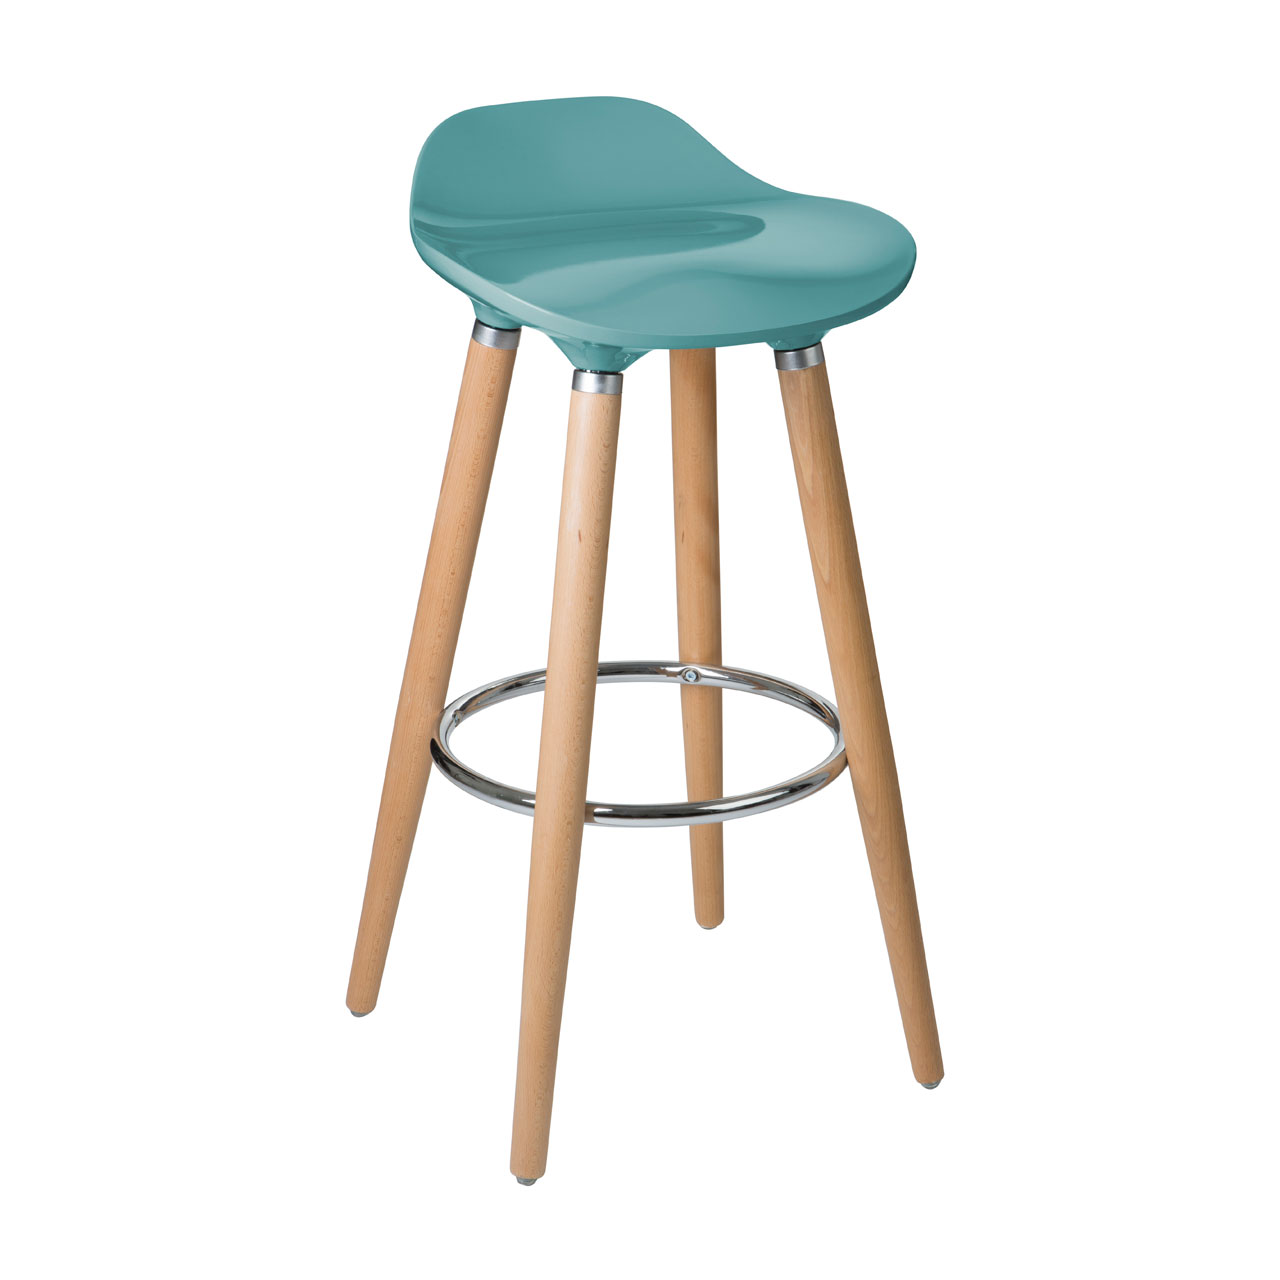 Teal Blue Bar Stool Beechwood Abs Gloss Finish Seat Kitchen Breakfast Cafe Chair Ebay